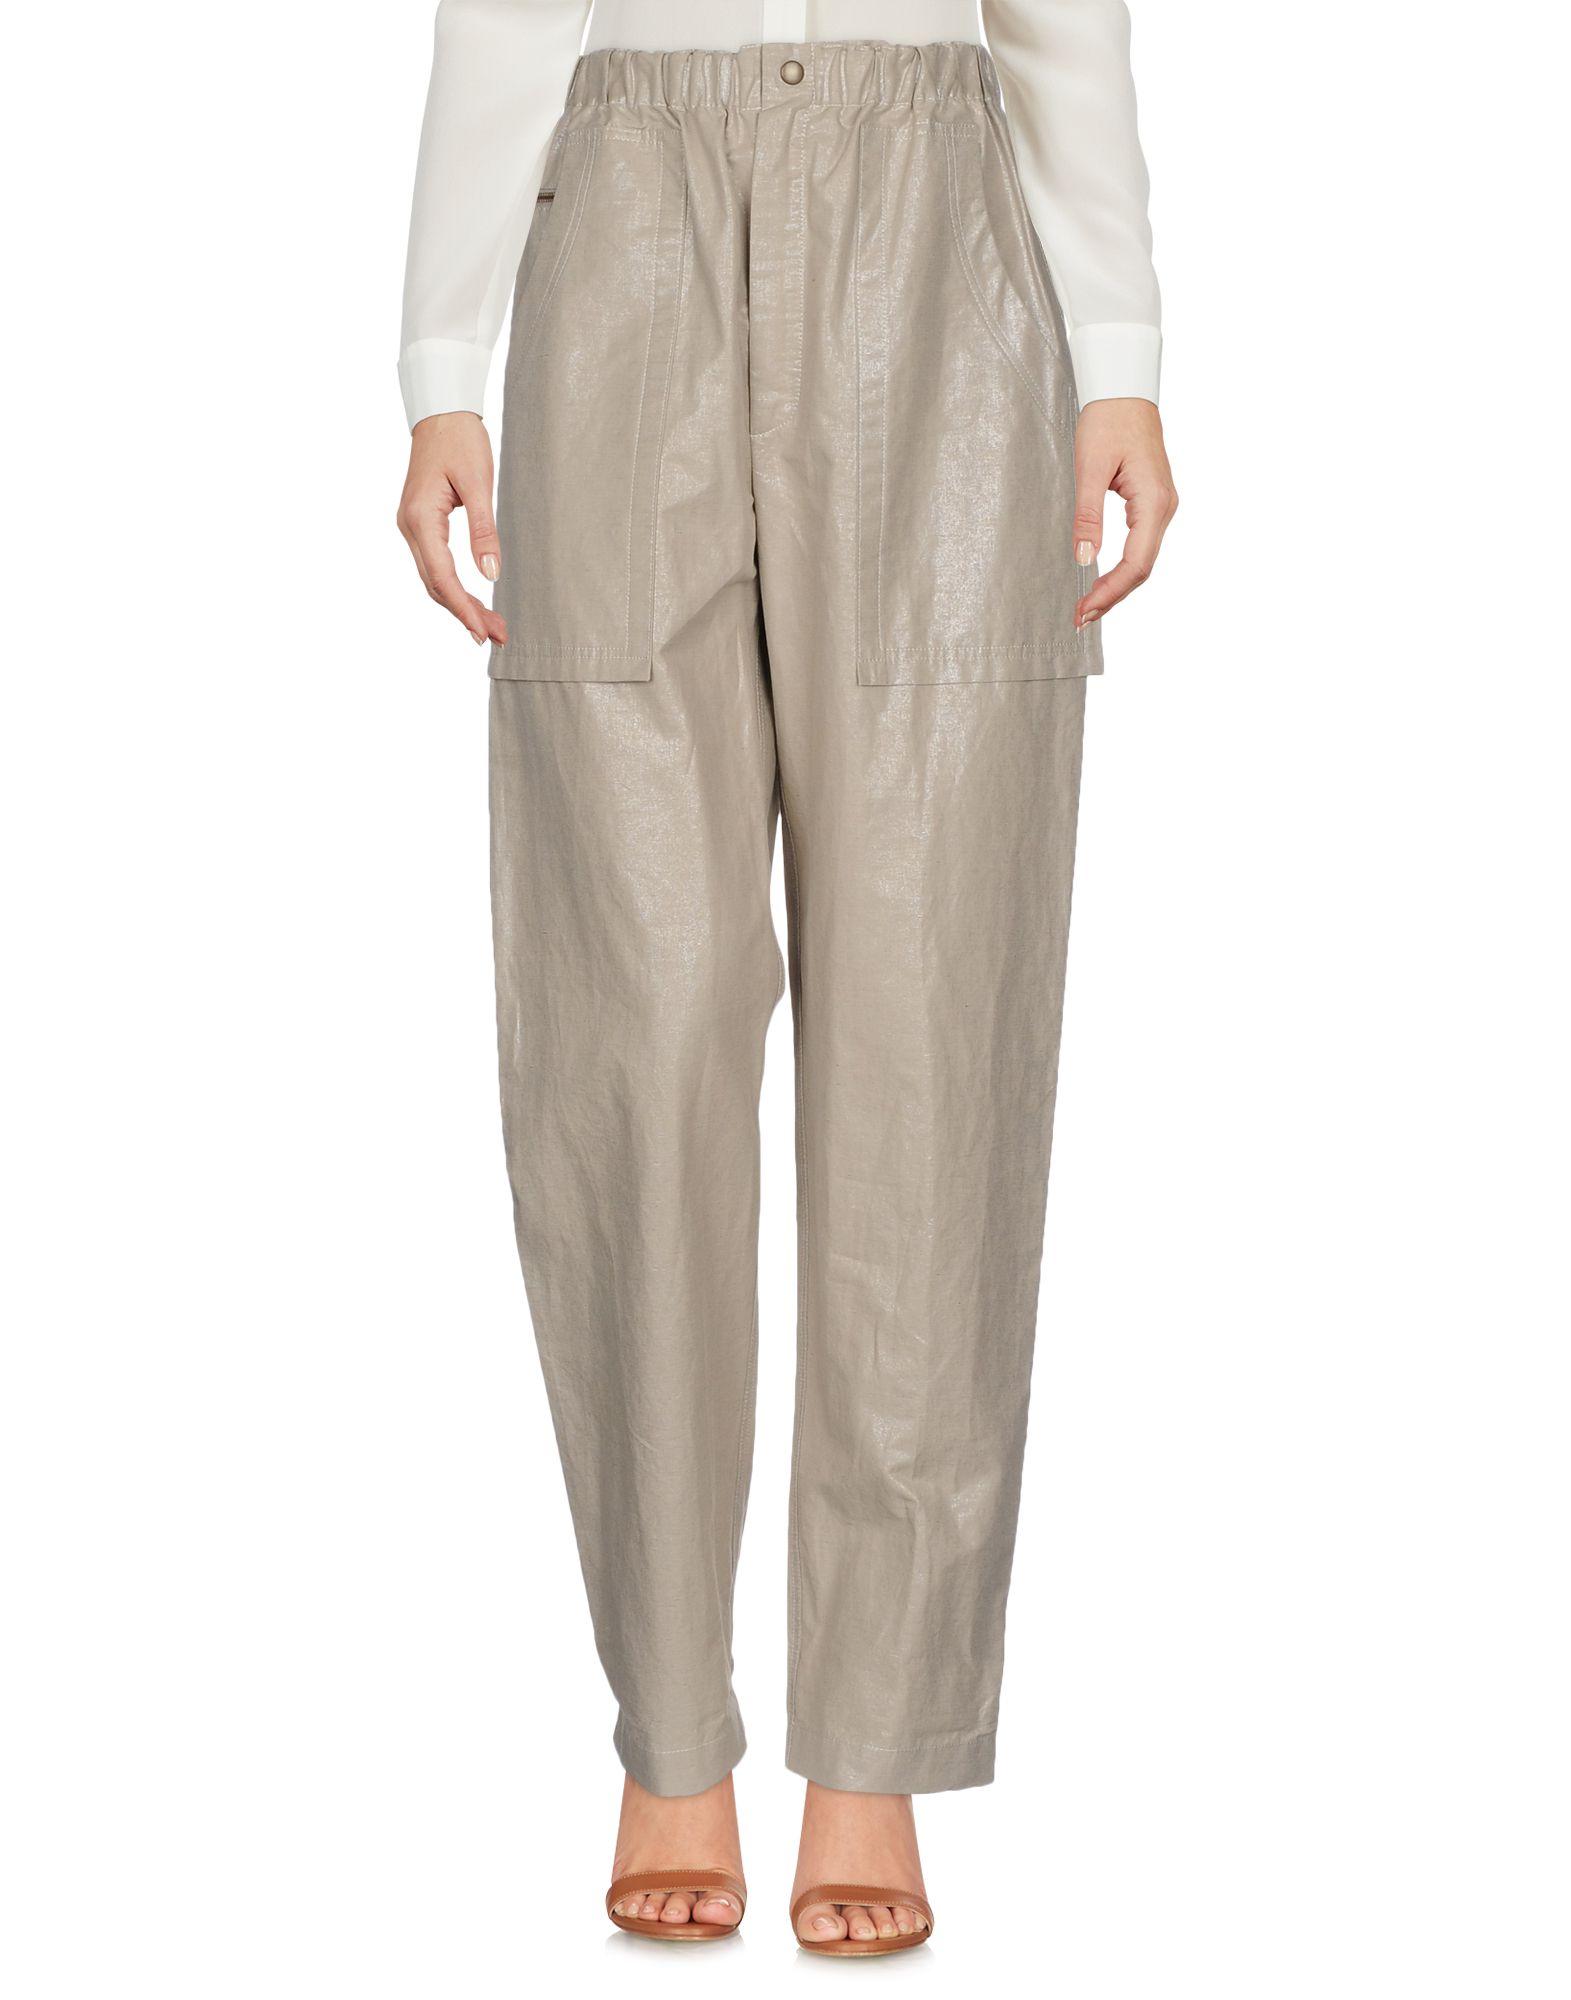 Pantalone Isabel Marant Donna - Acquista online su H3LbD